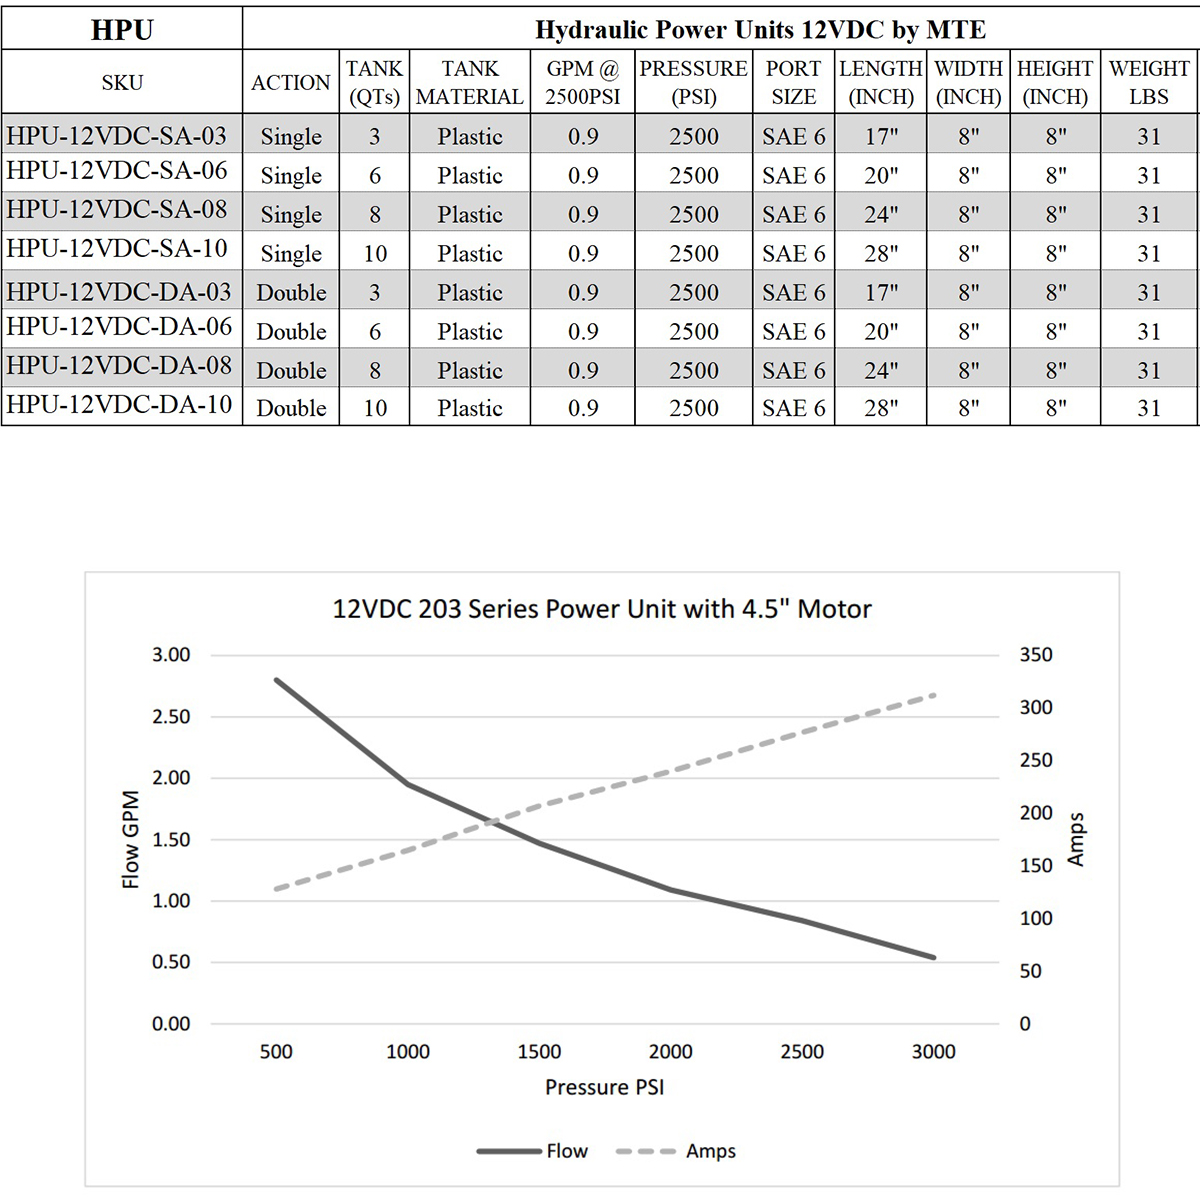 single acting 3 quarts hydraulic power unit 12V DC by MTE